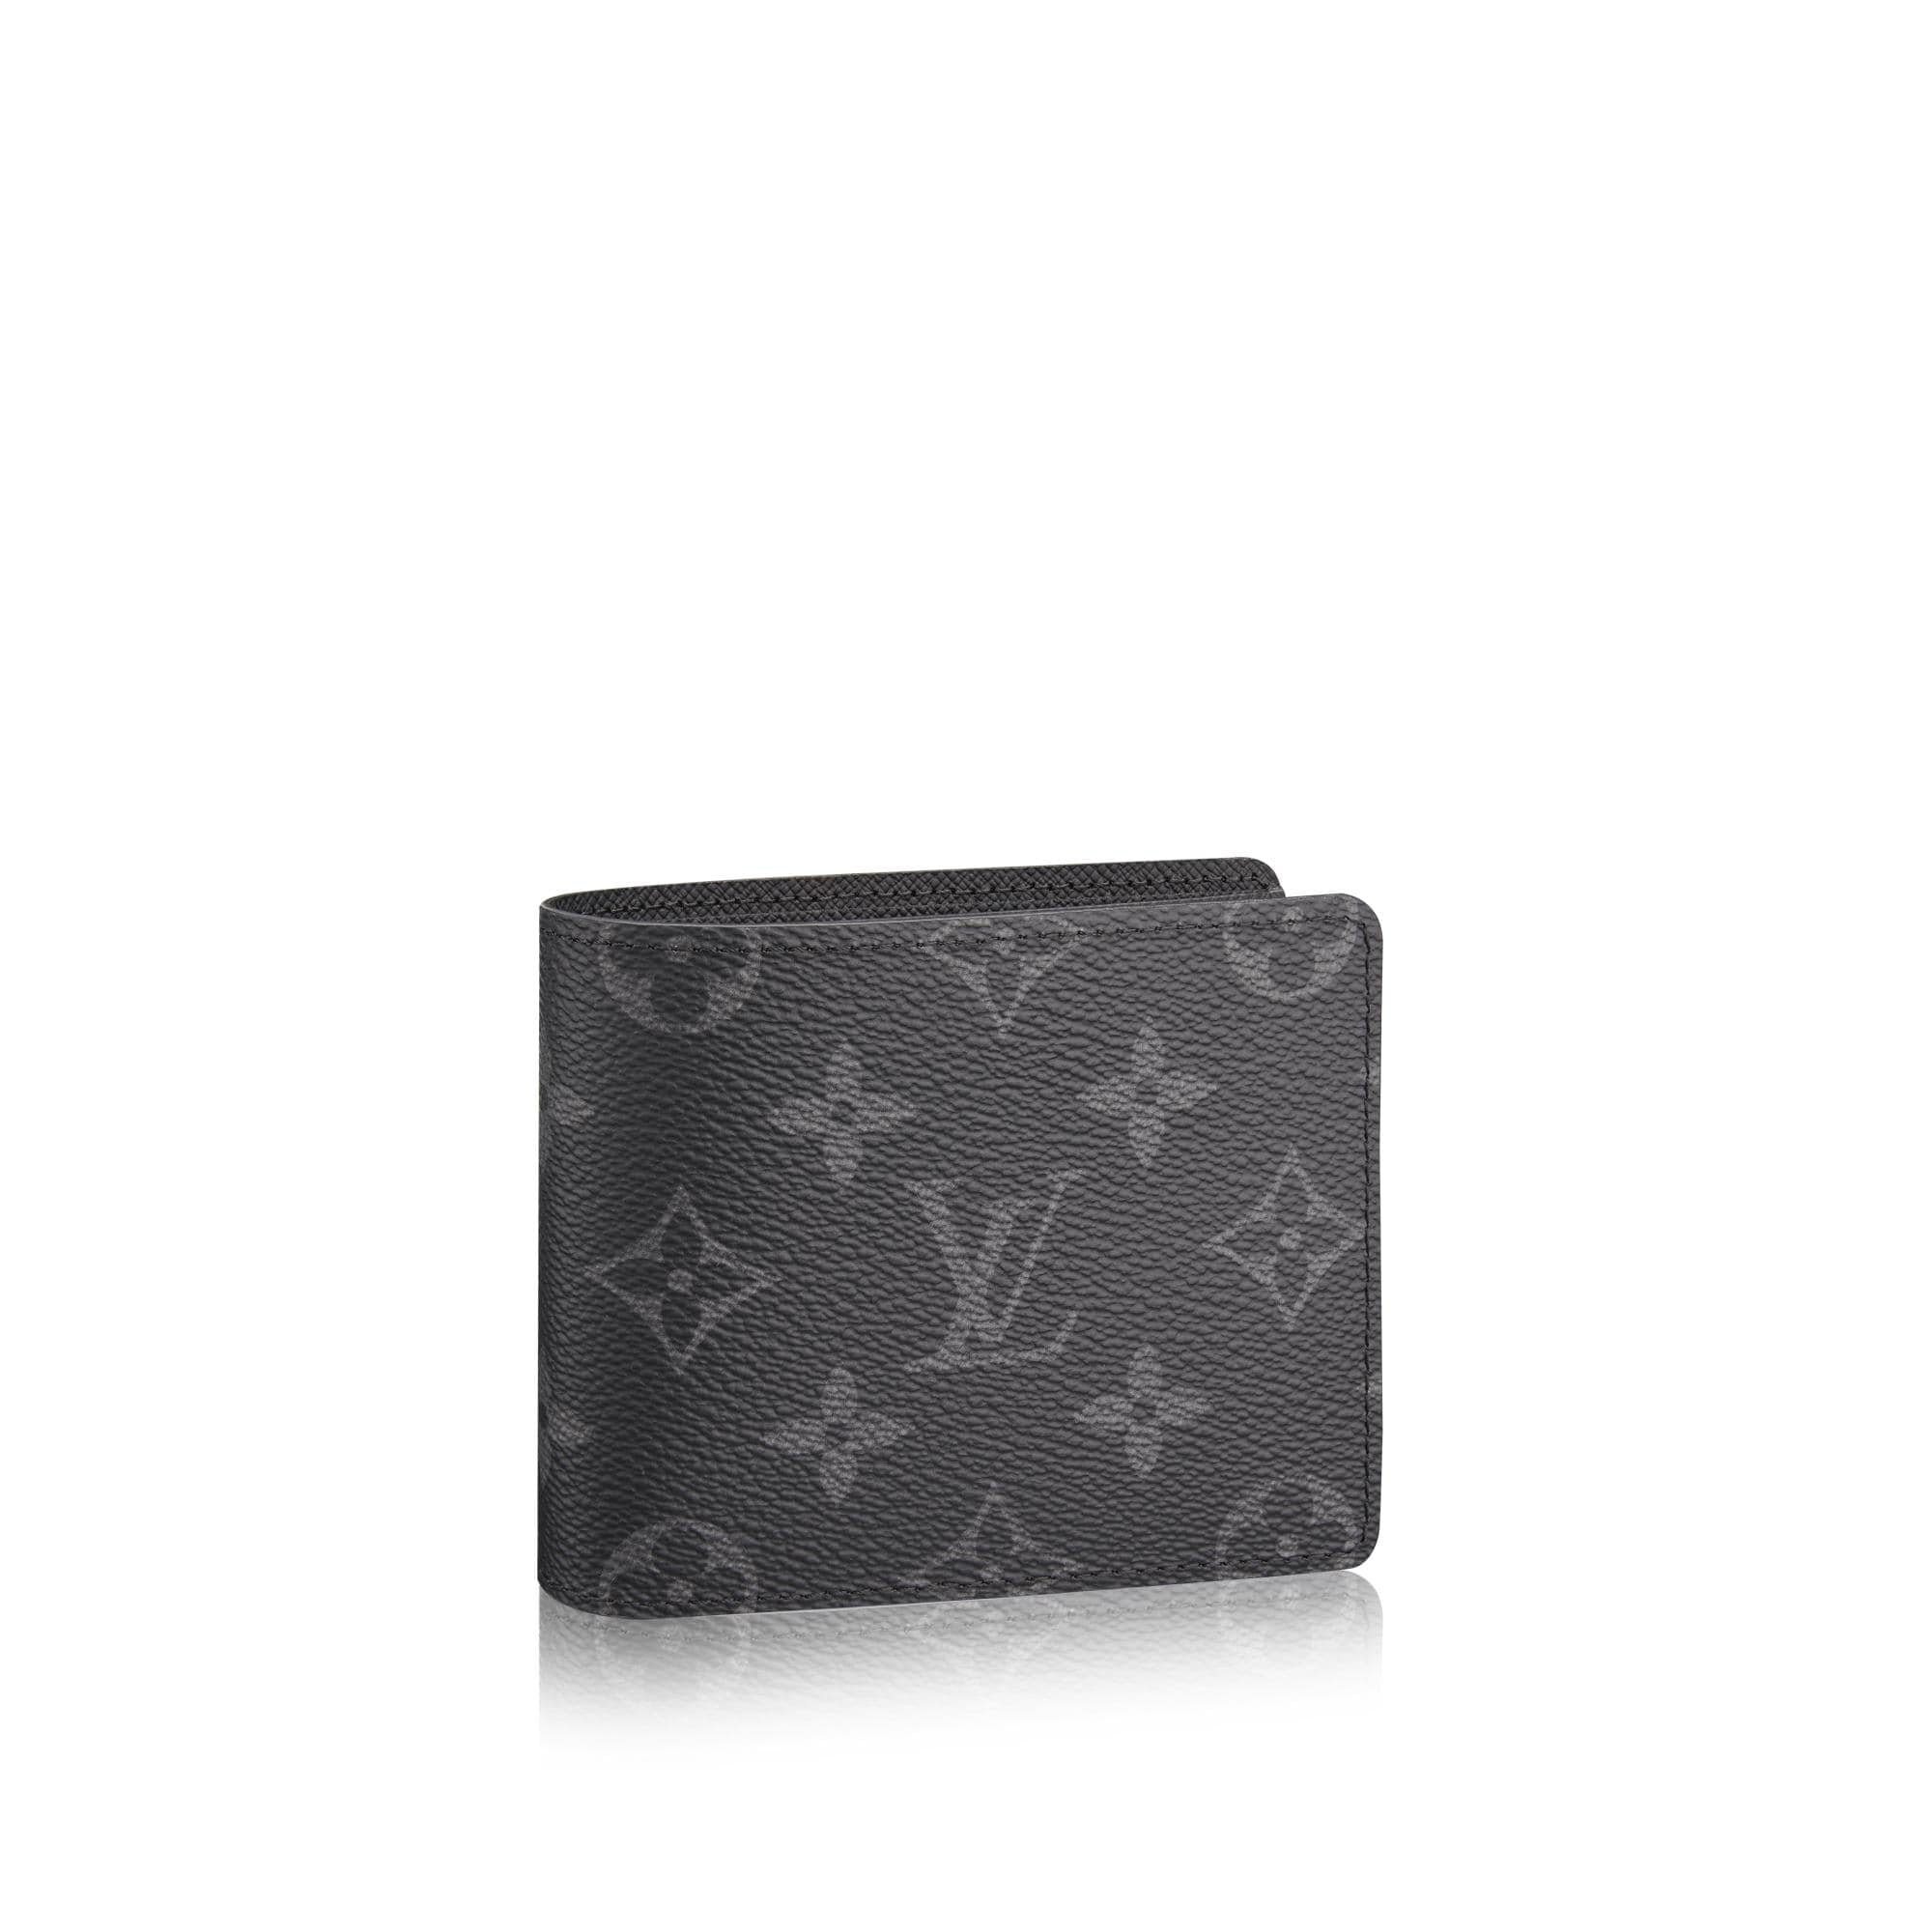 Louis Vuitton Wallet Slender Monogram Eclipse Black/Grey